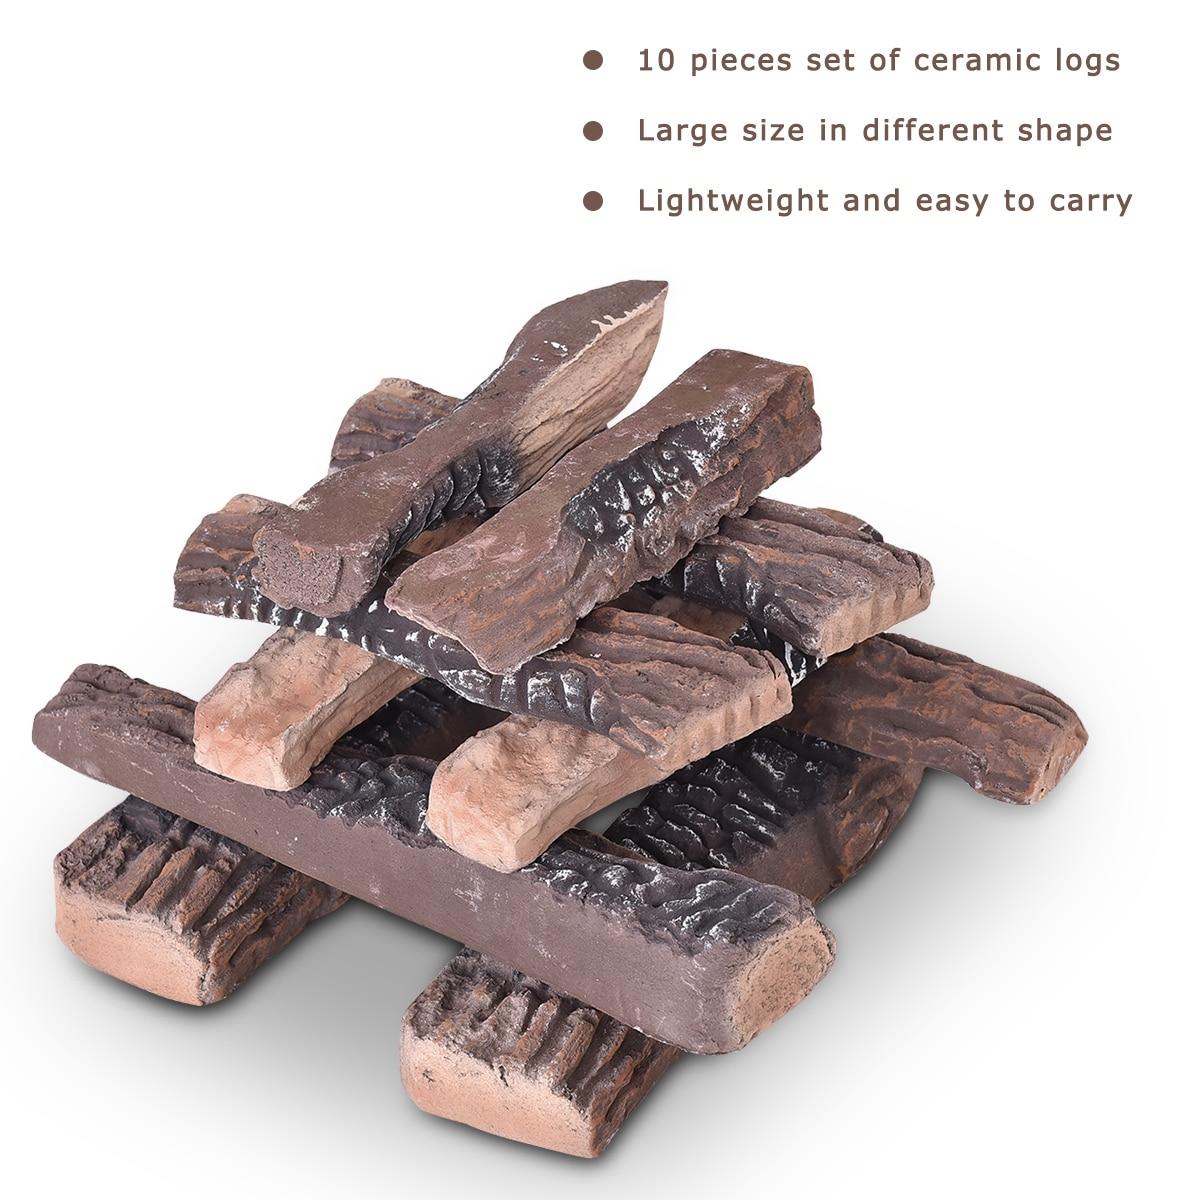 9PCS Ceramic Wood Gas Log Set Fireplace Imitation Wood Propane Firepit Log sets